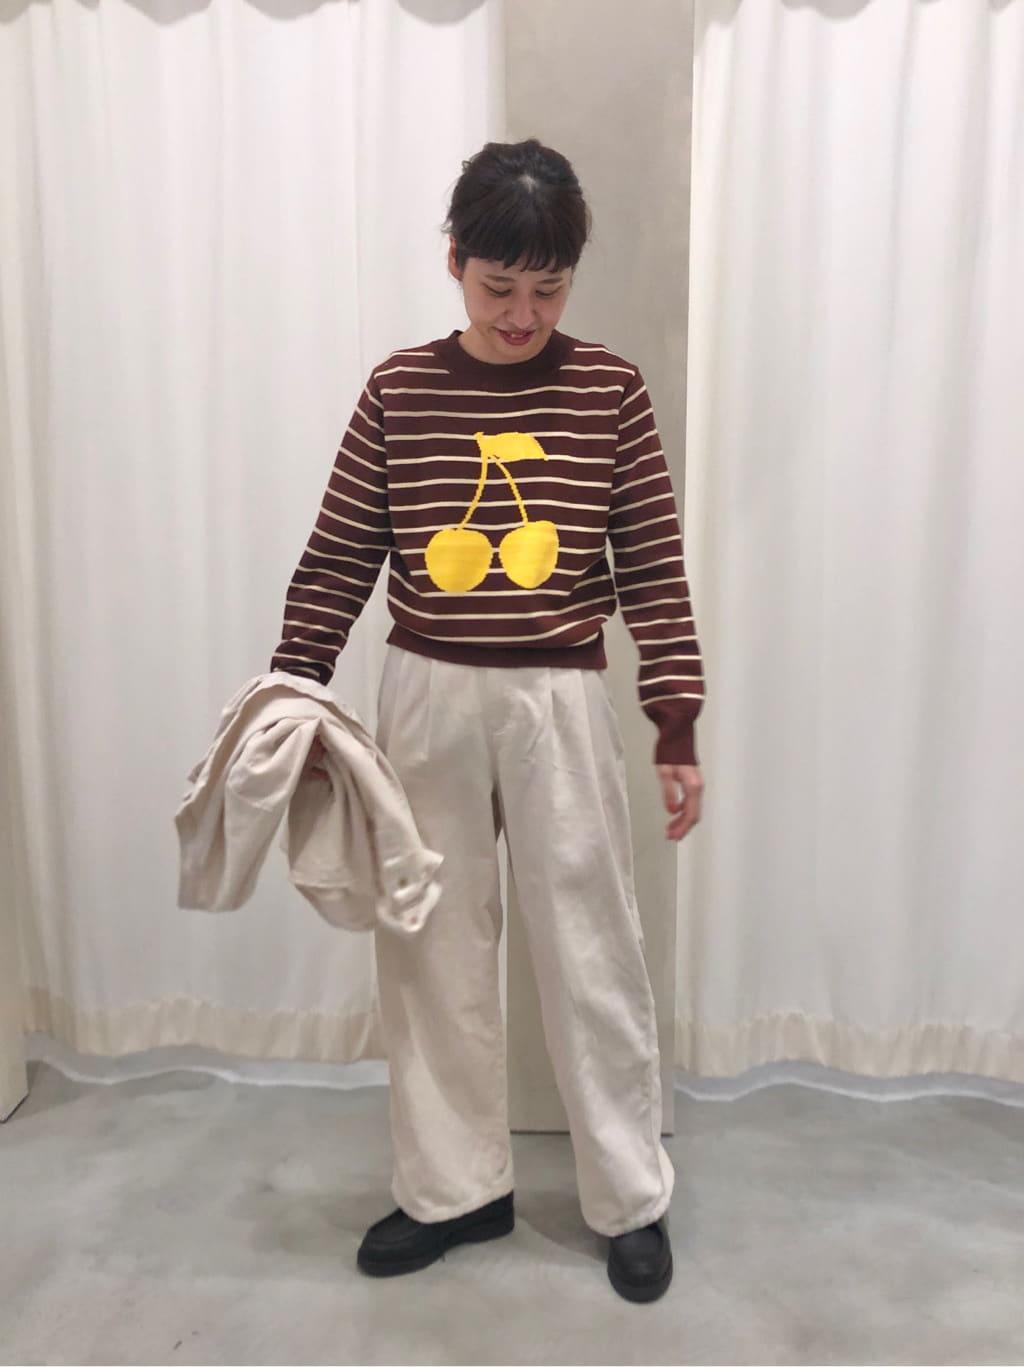 - CHILD WOMAN CHILD WOMAN , PAR ICI 東京スカイツリータウン・ソラマチ 身長:160cm 2021.08.31